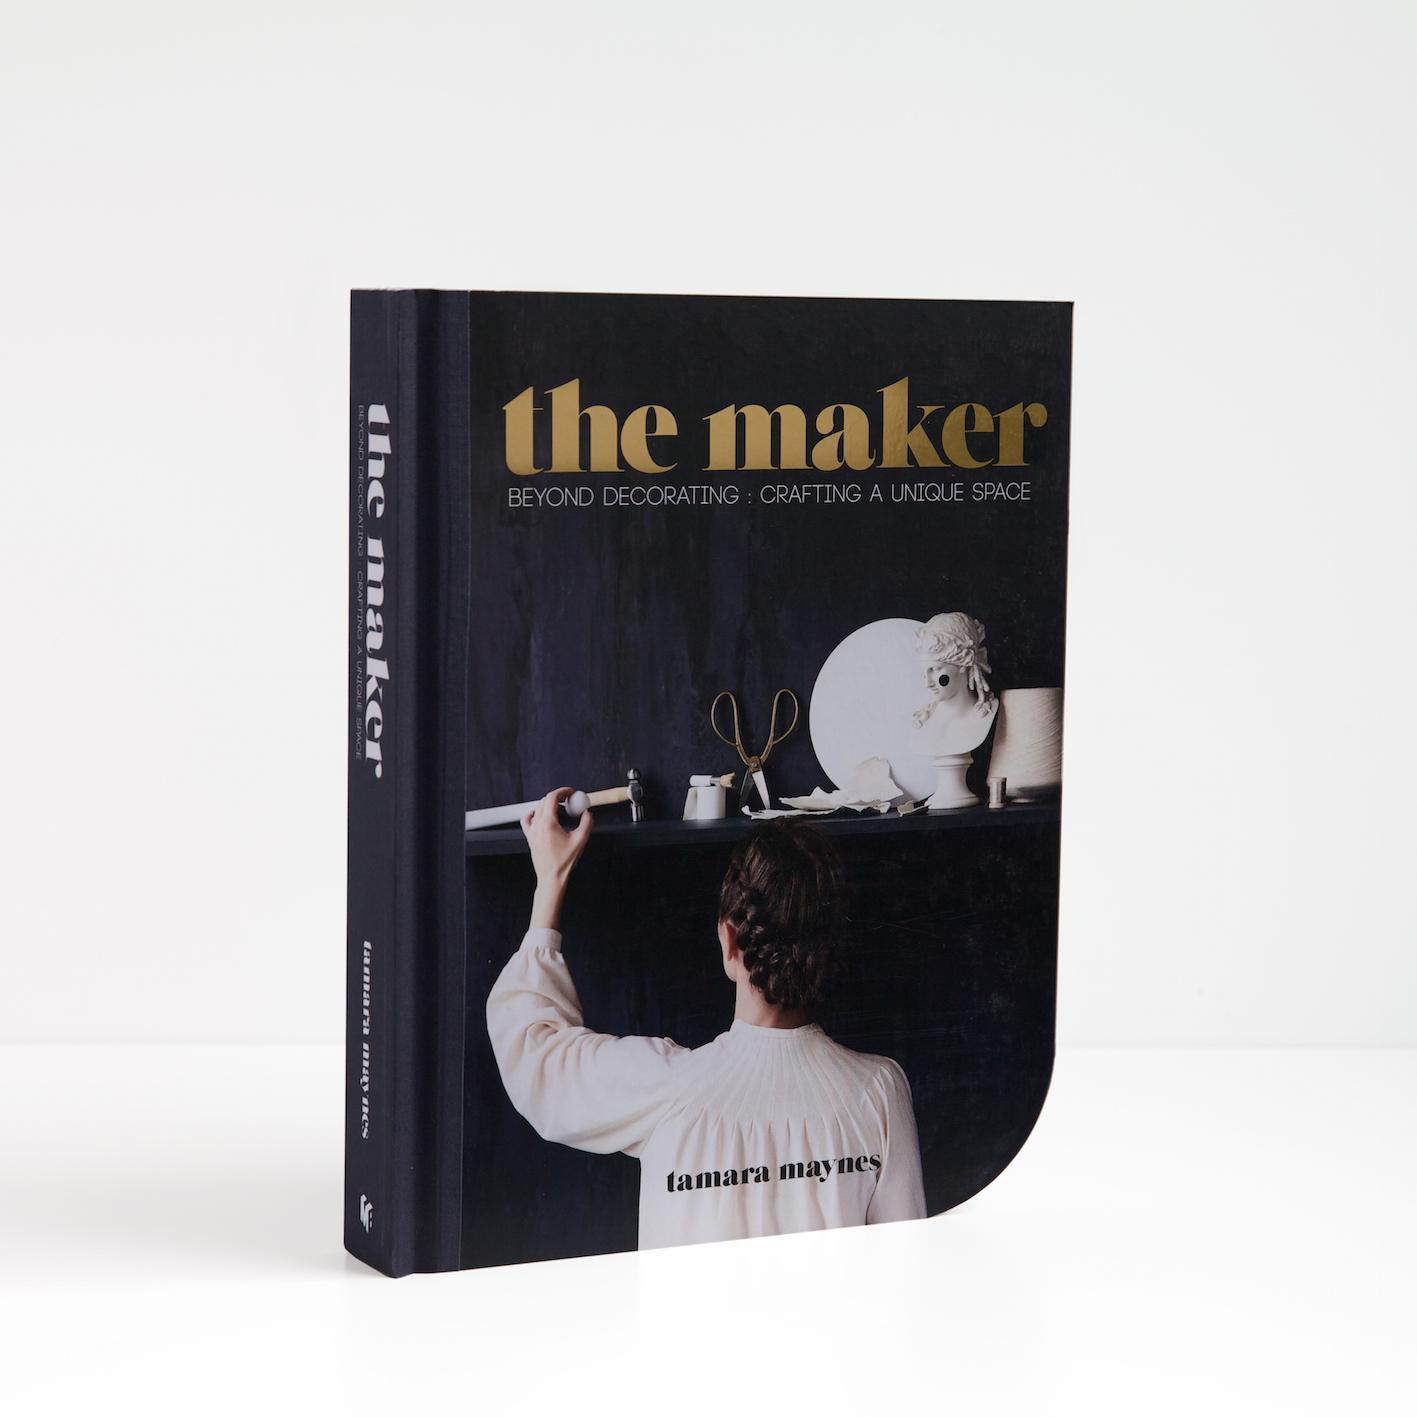 The Maker_Tamara Maynes_cover2 copy.jpg